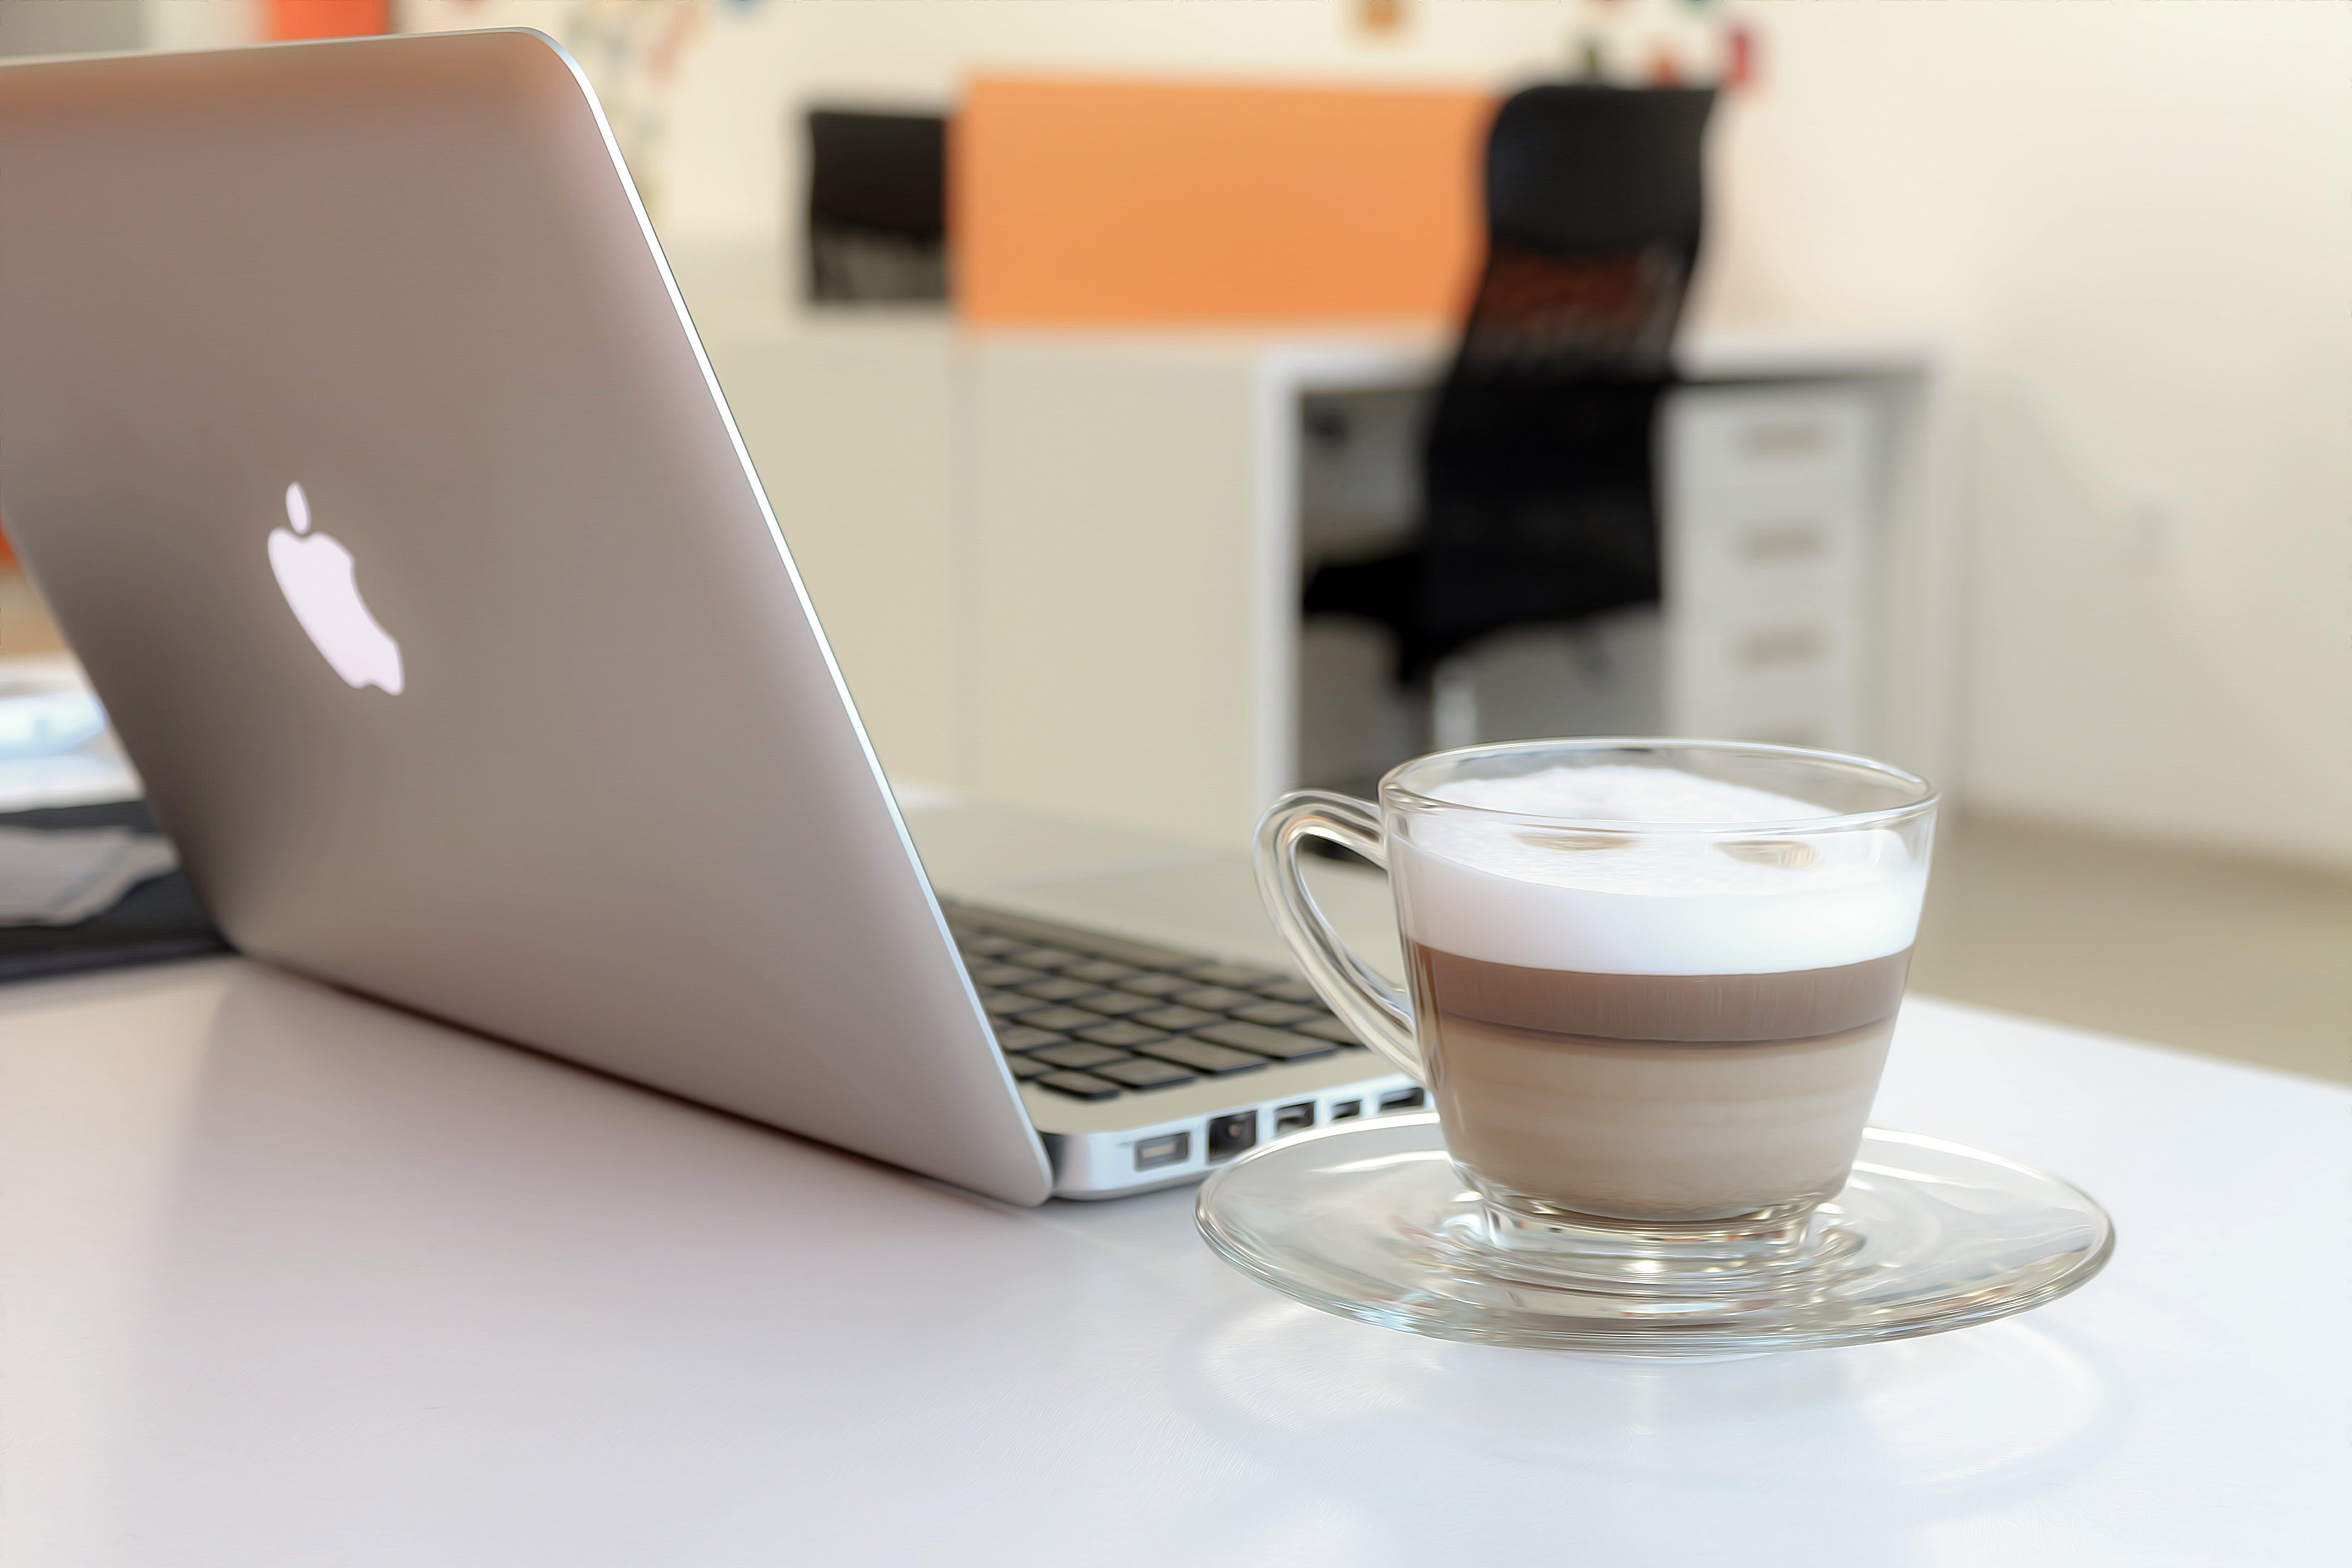 Macbook Pro Besides Clear Glass Mug